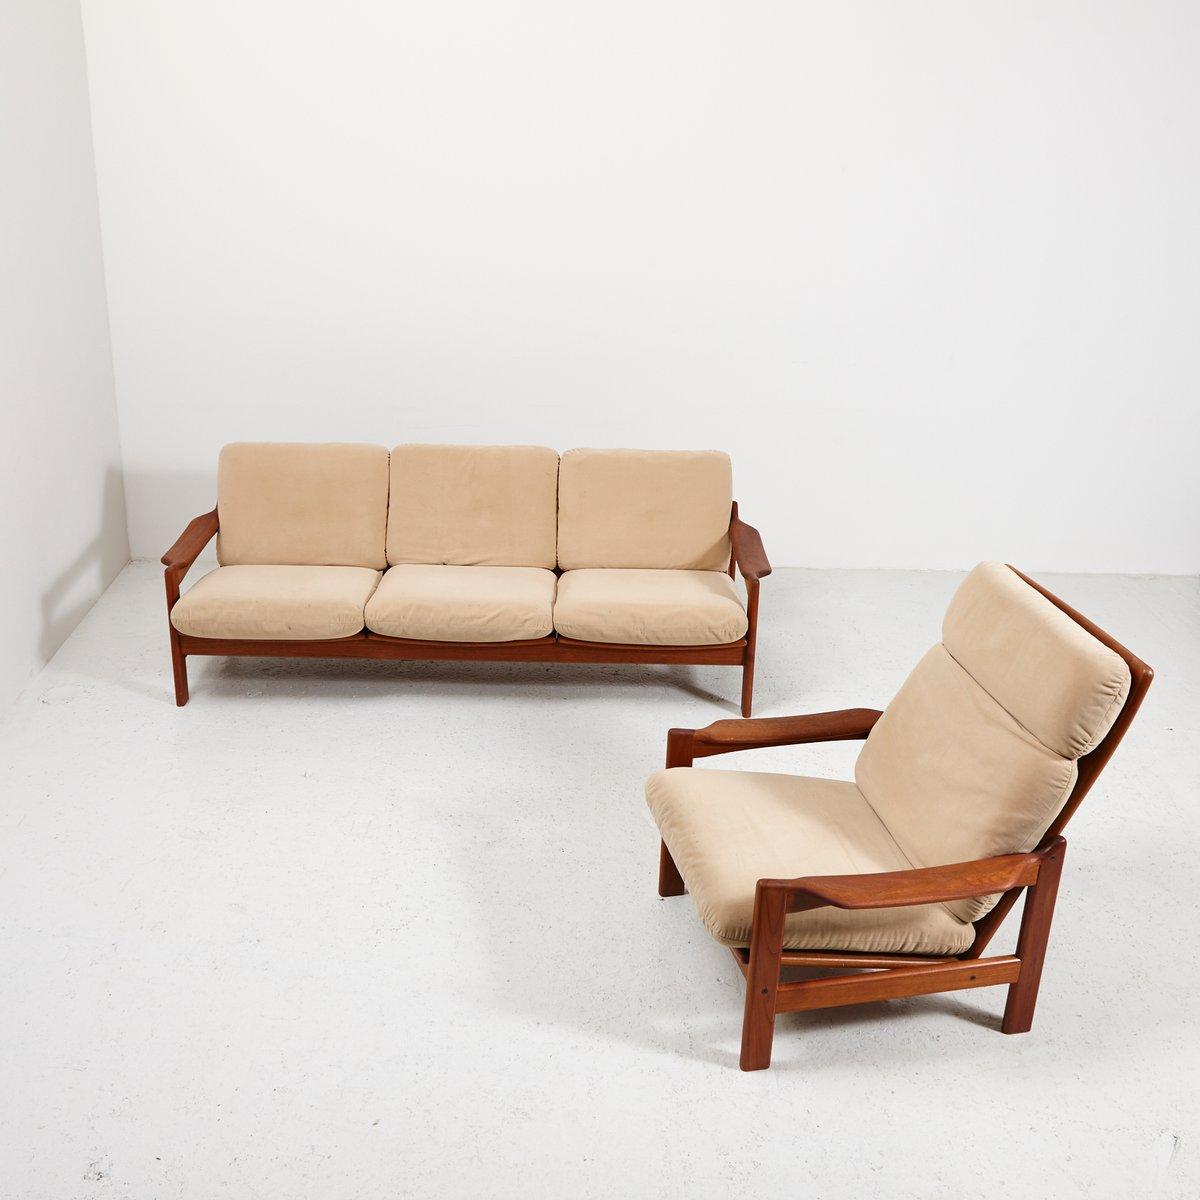 Danish Teak Living Room Set, 1970s for sale at Pamono